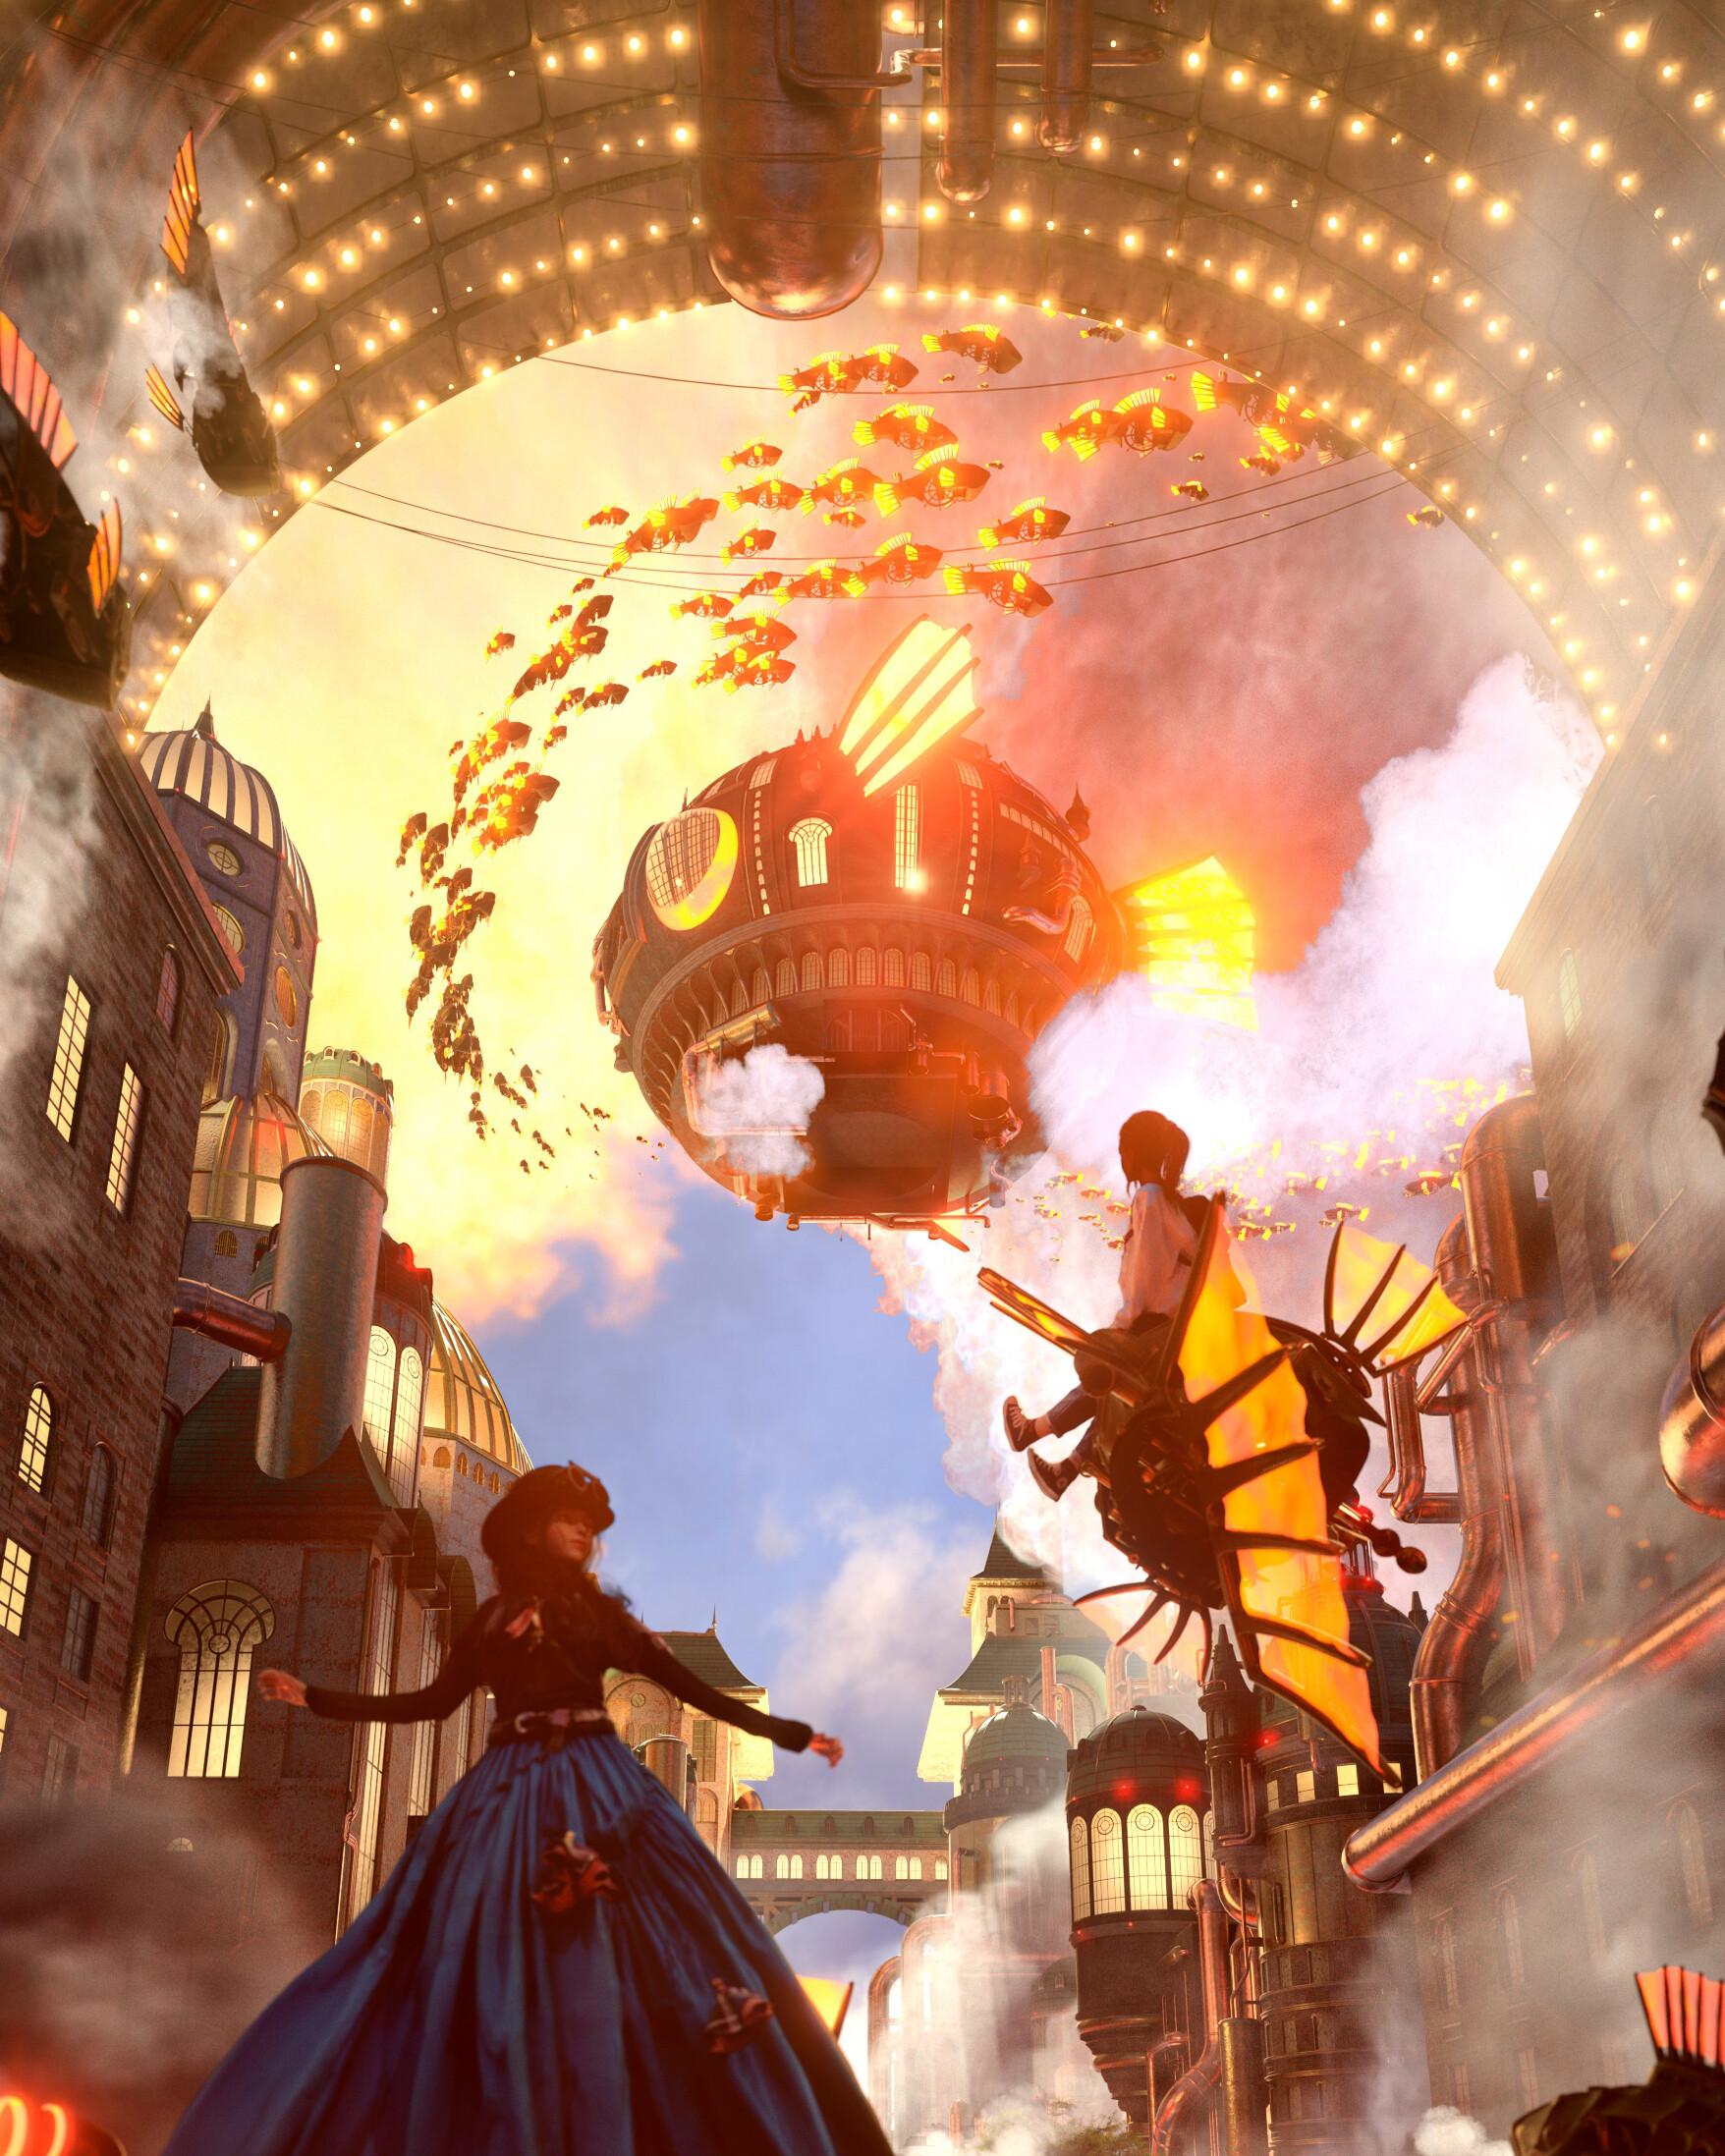 严圻作品《Trailblazer: A Retrofuturistic Fantasy》 - Renderbus云渲染农场